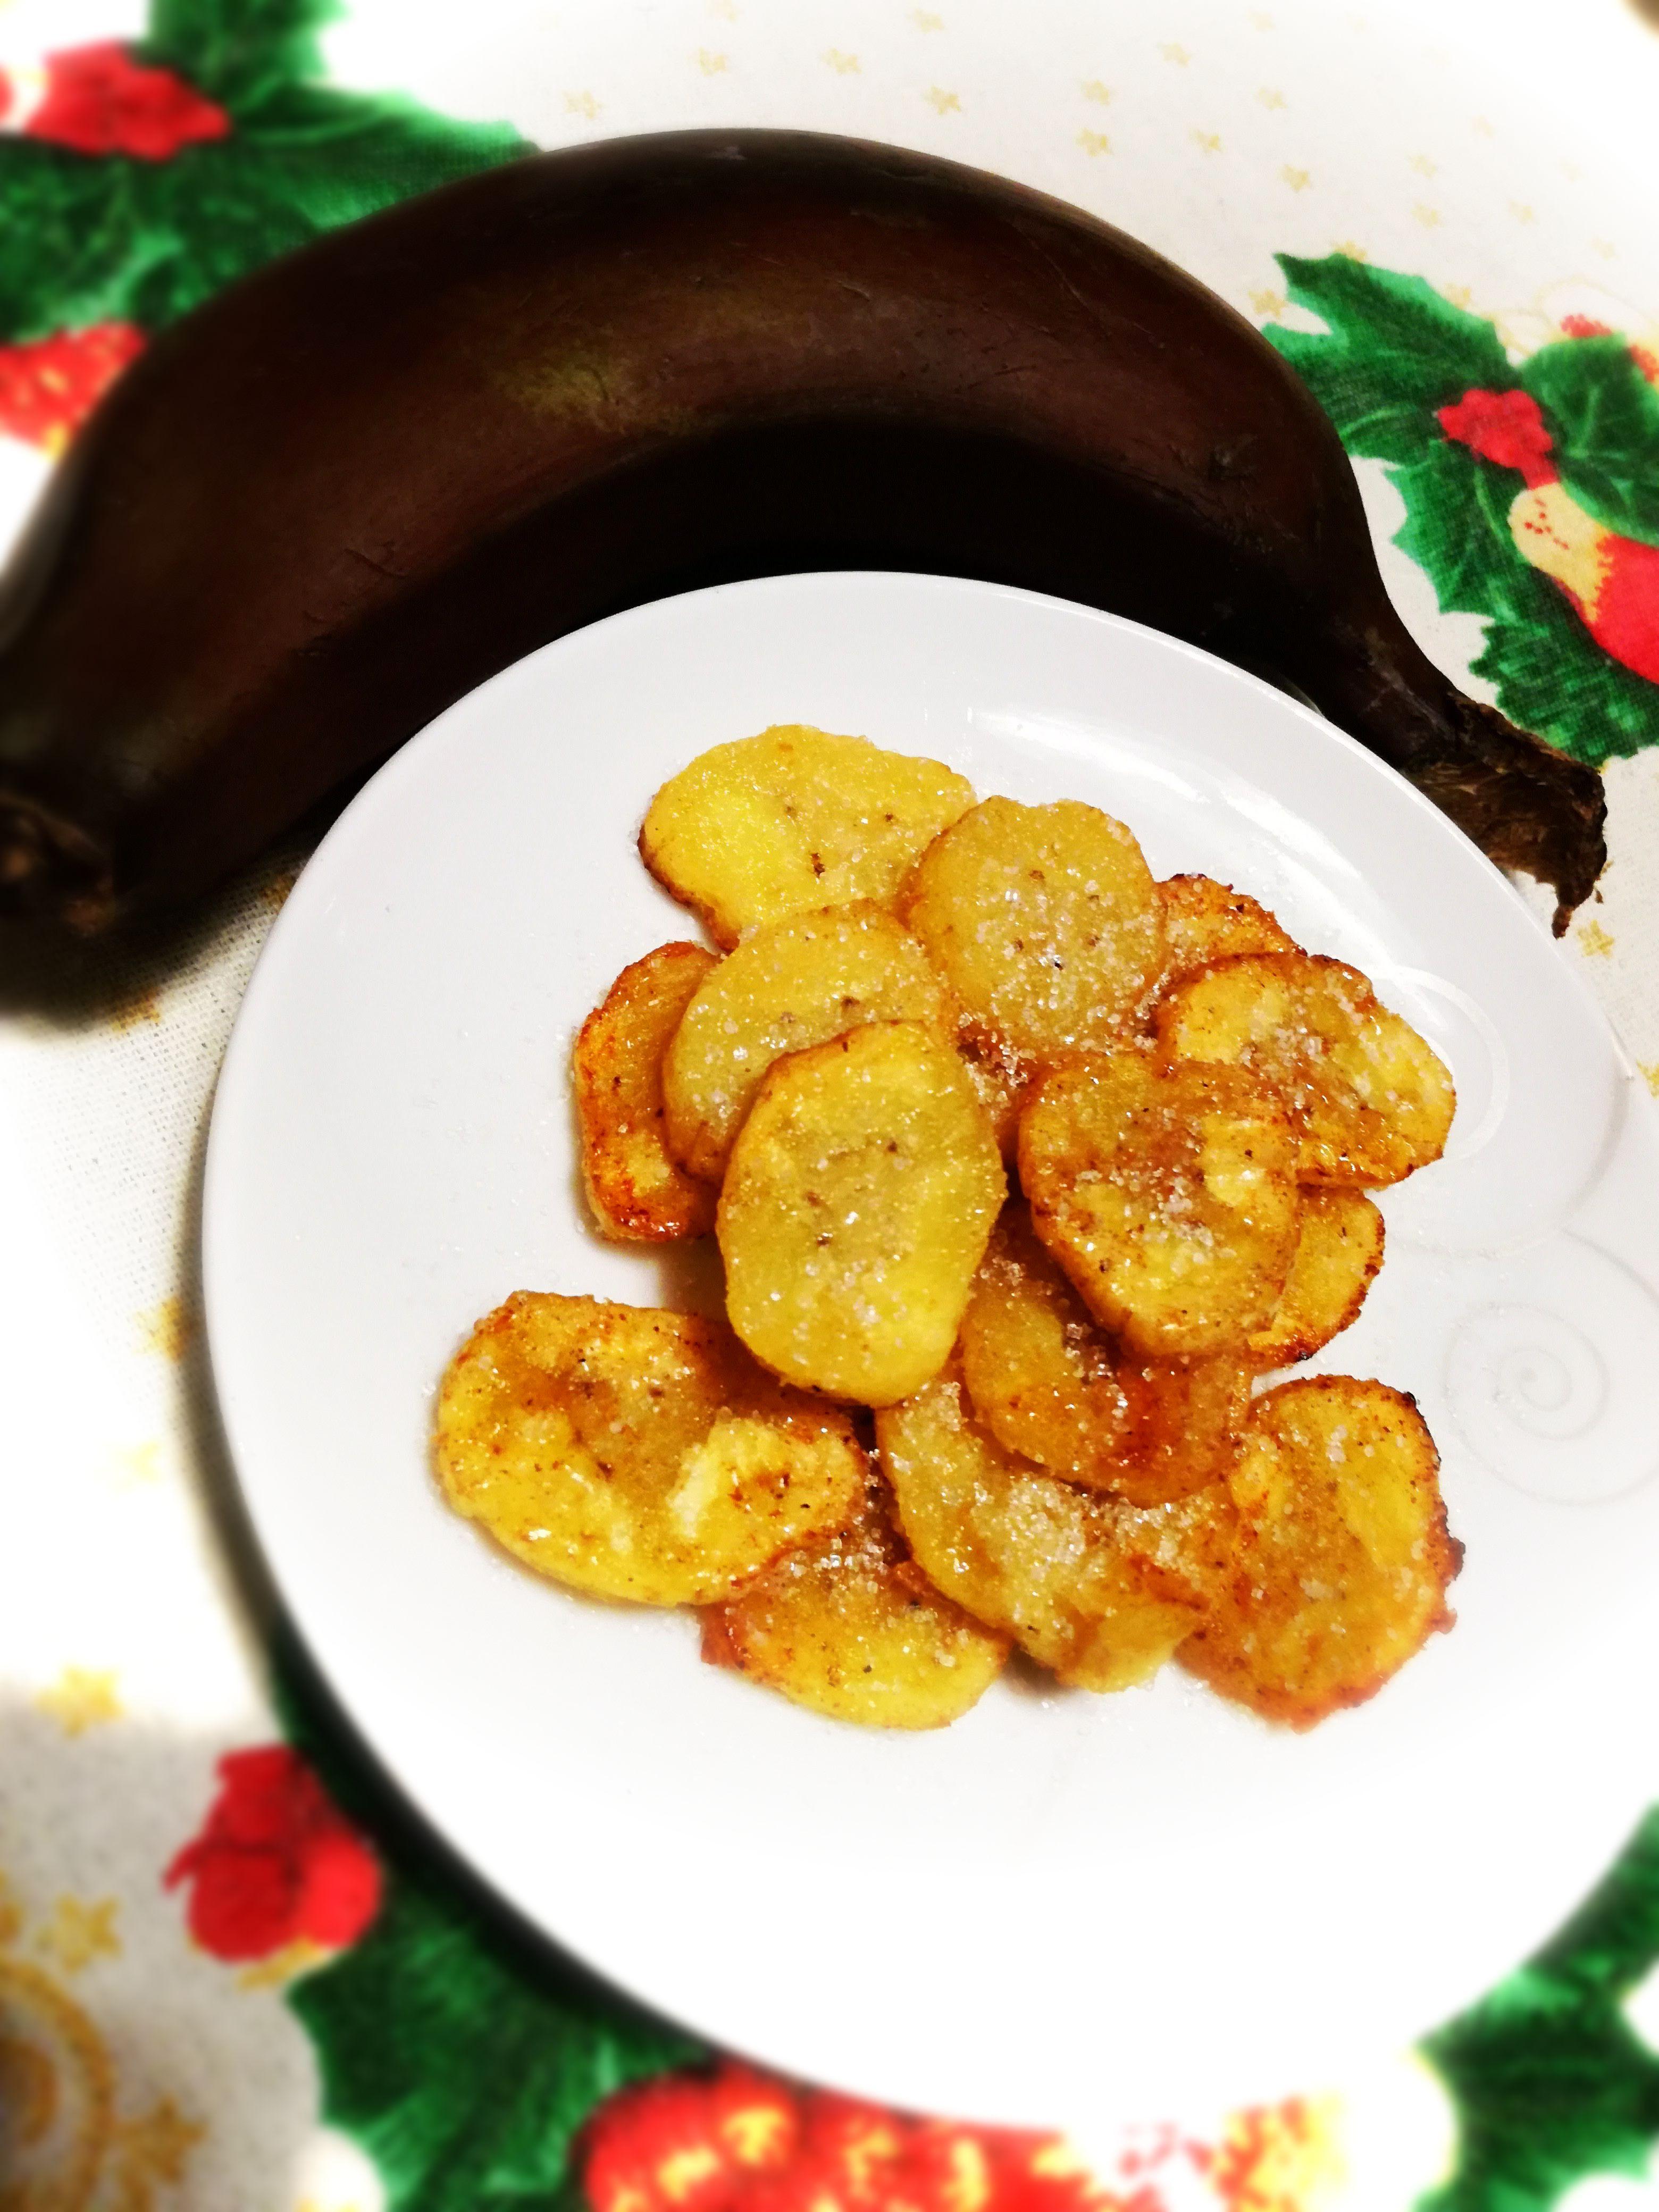 Banana rossa fritta